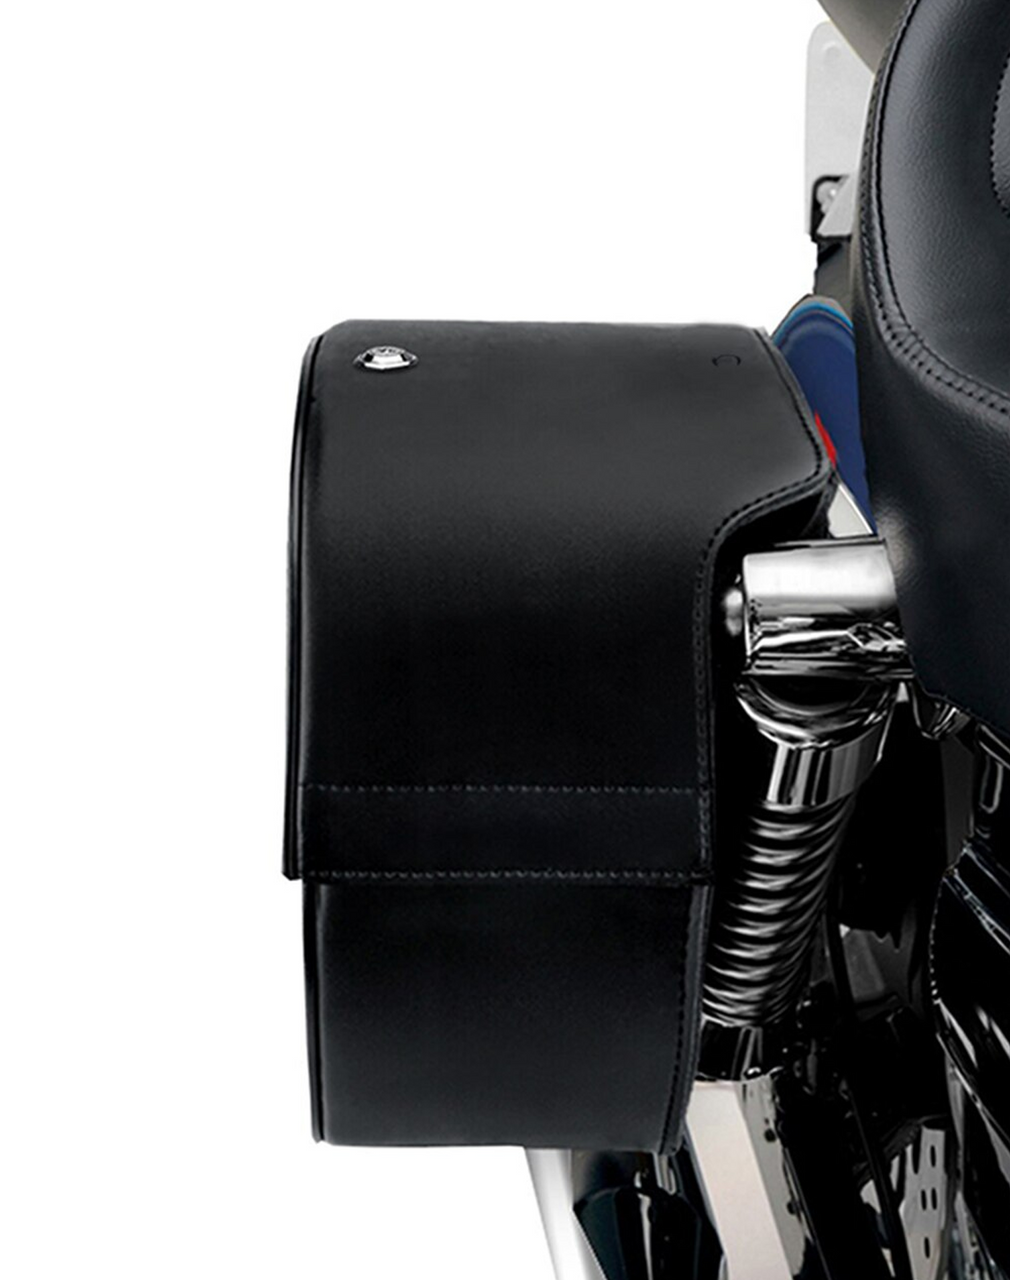 Kawasaki Eliminator 125 Shock Cutout Slanted Large Motorcycle Saddlebags Shock Cutout  View